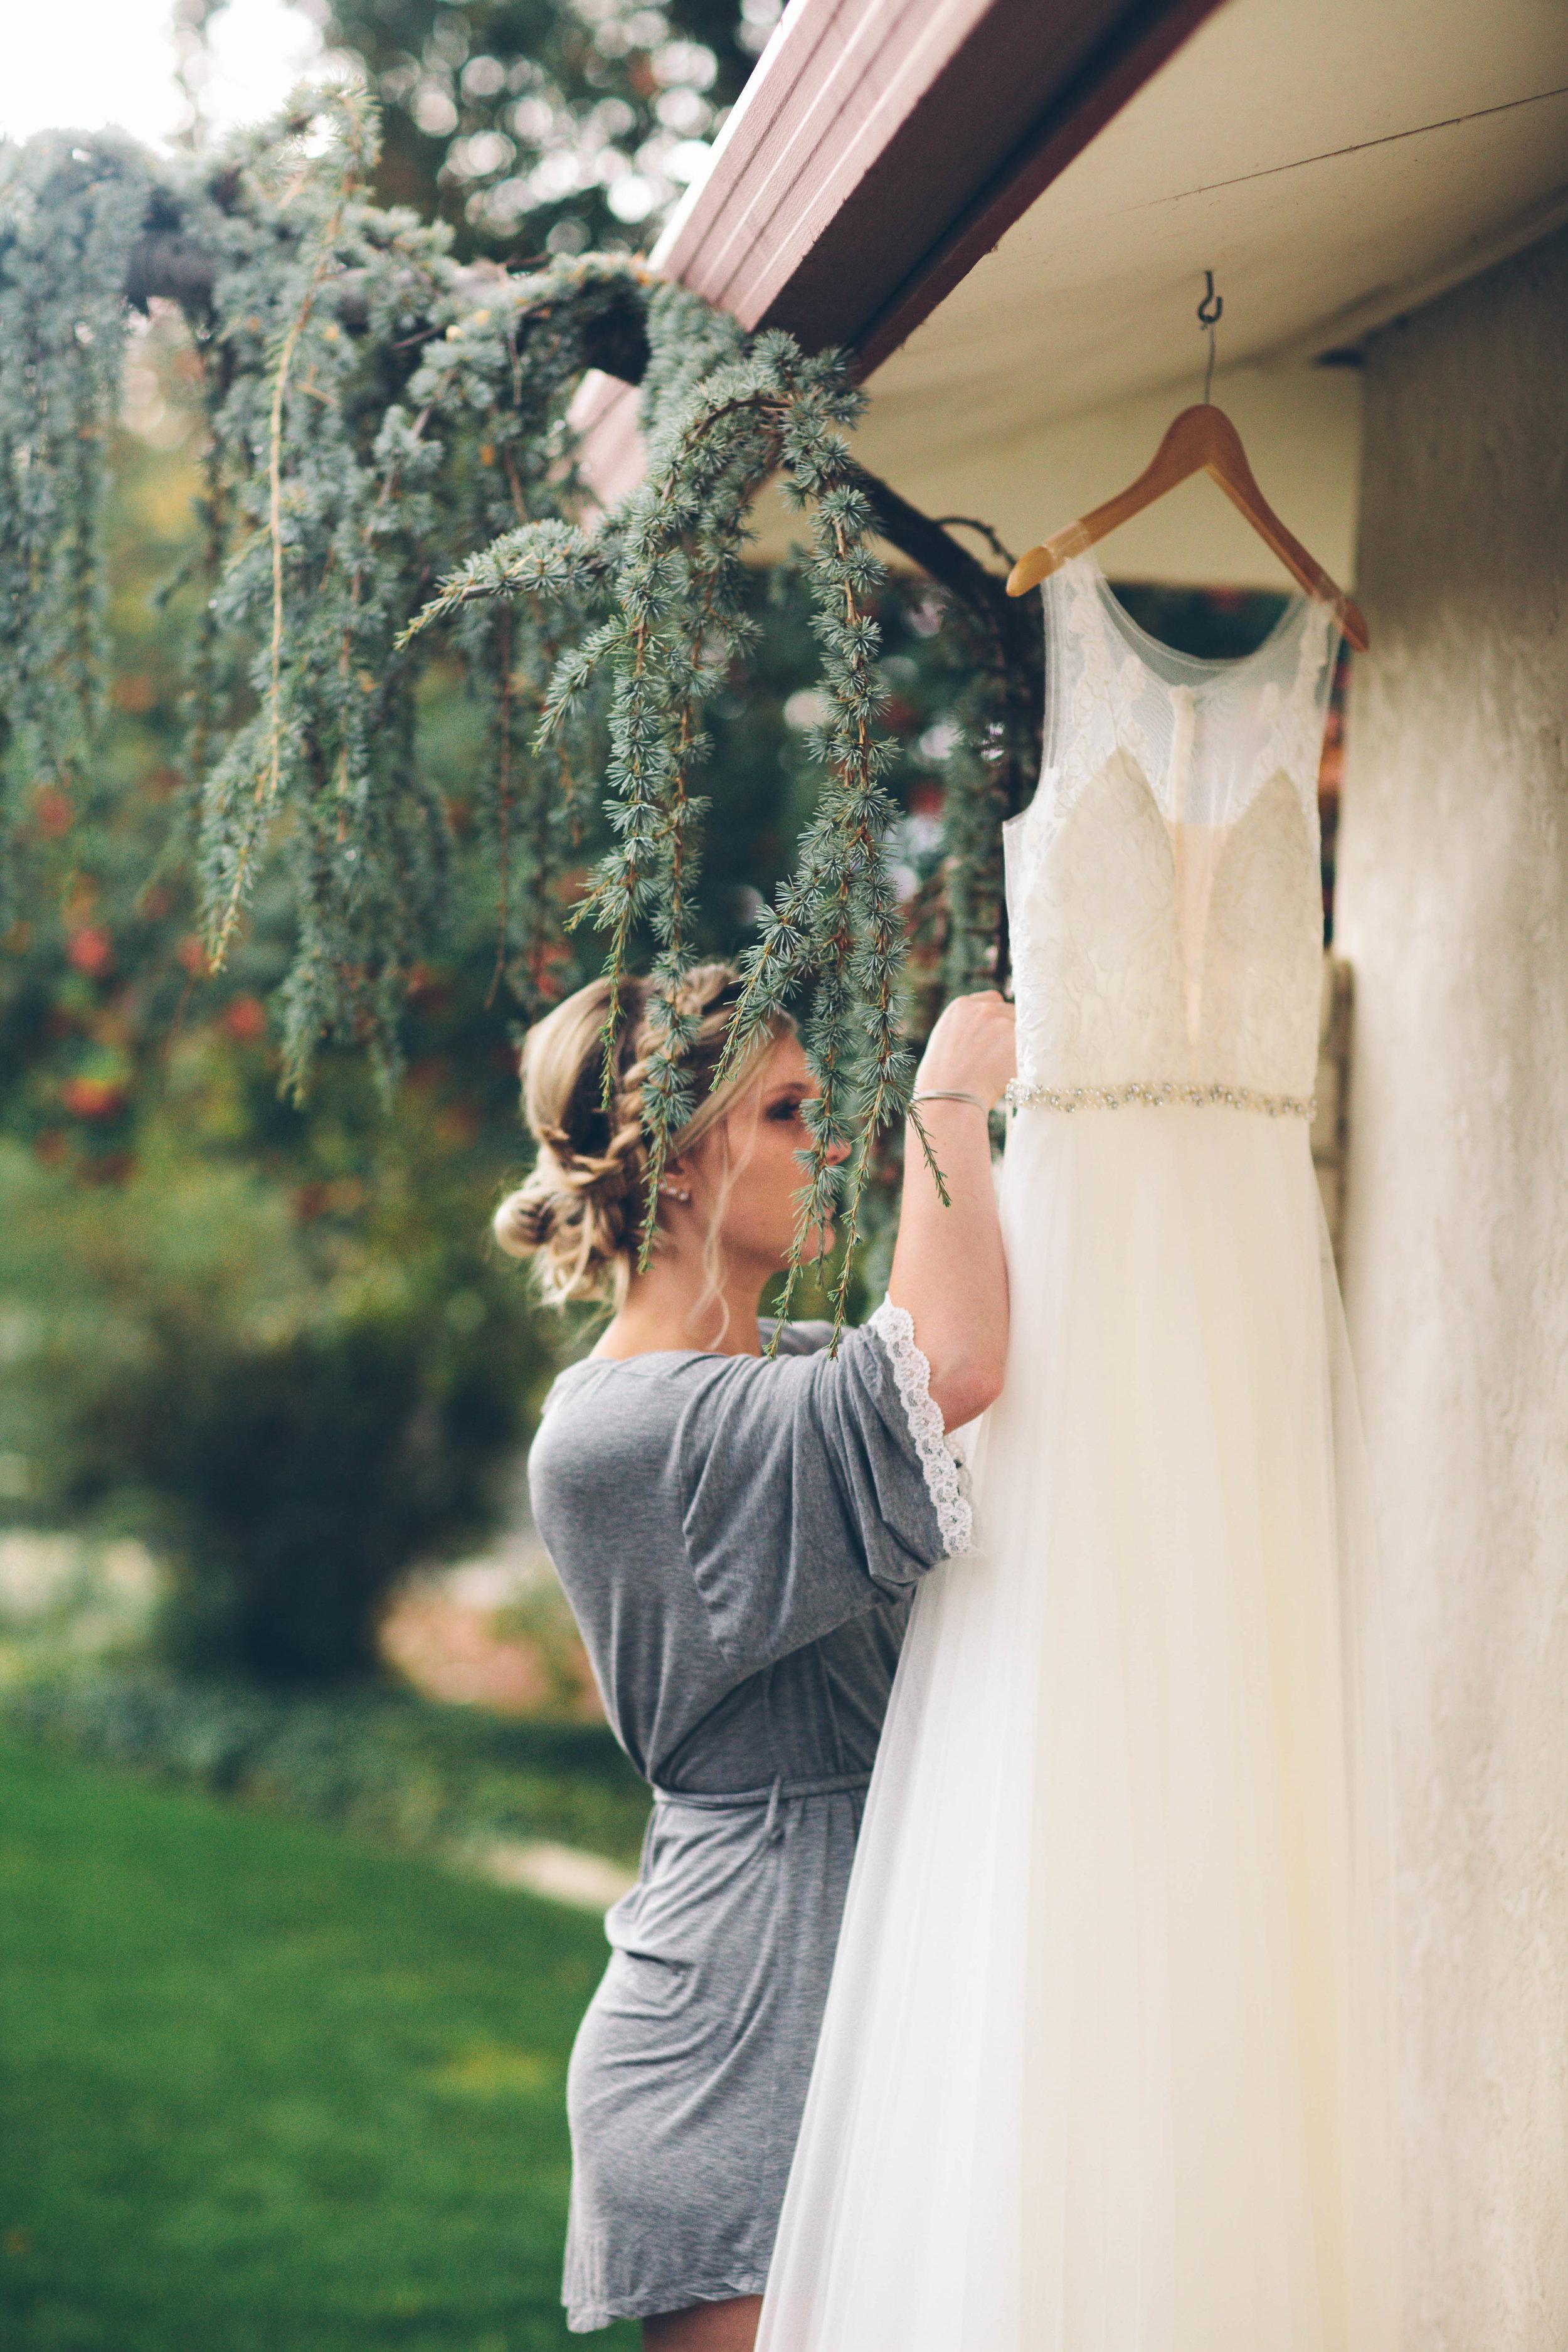 bridesmaids prepping the gown spokane wedding